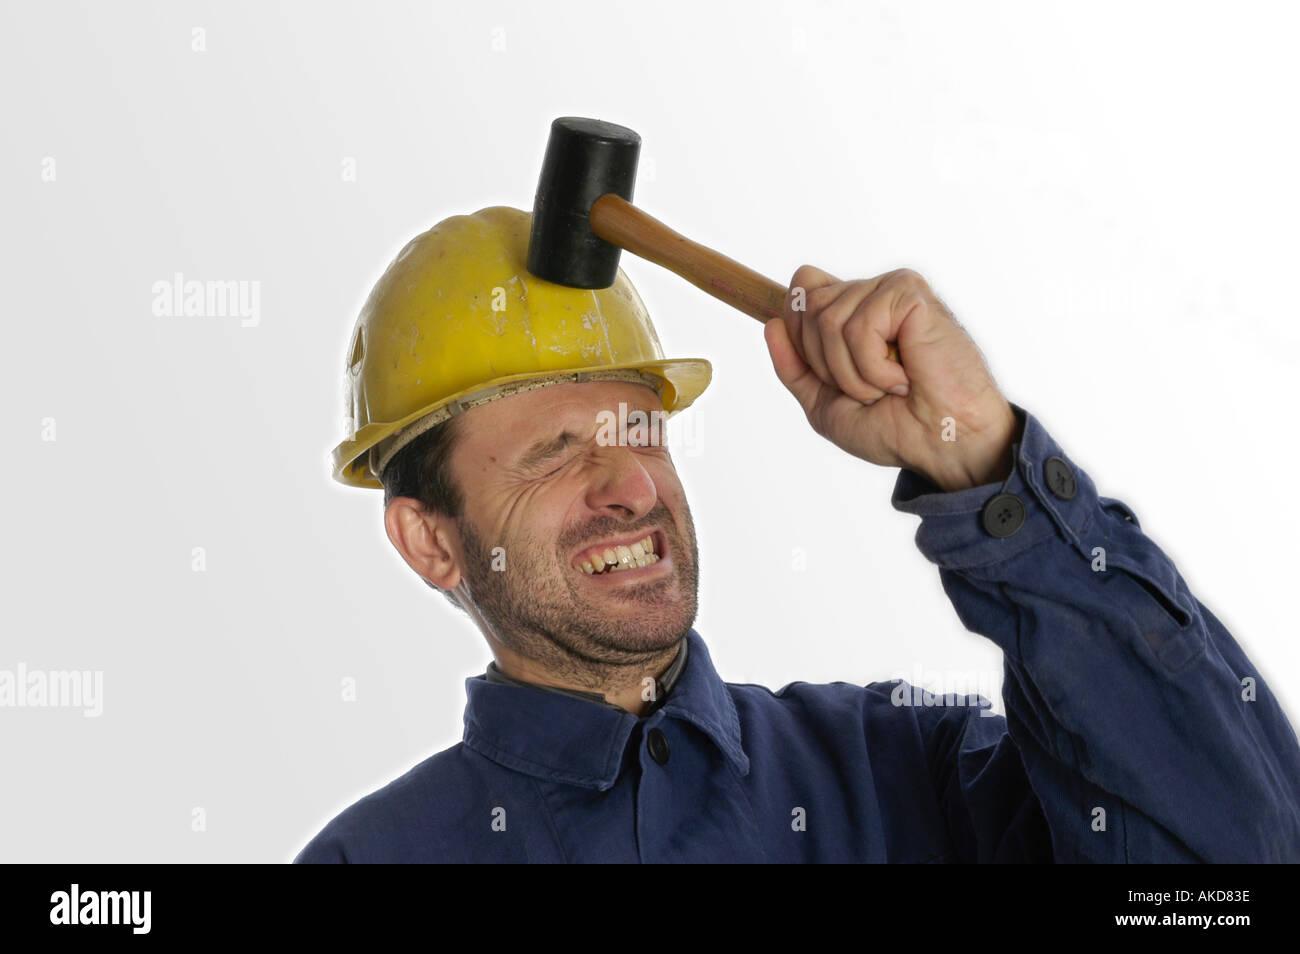 Construction Hammer Anger Symbol Pressure Stock Photos